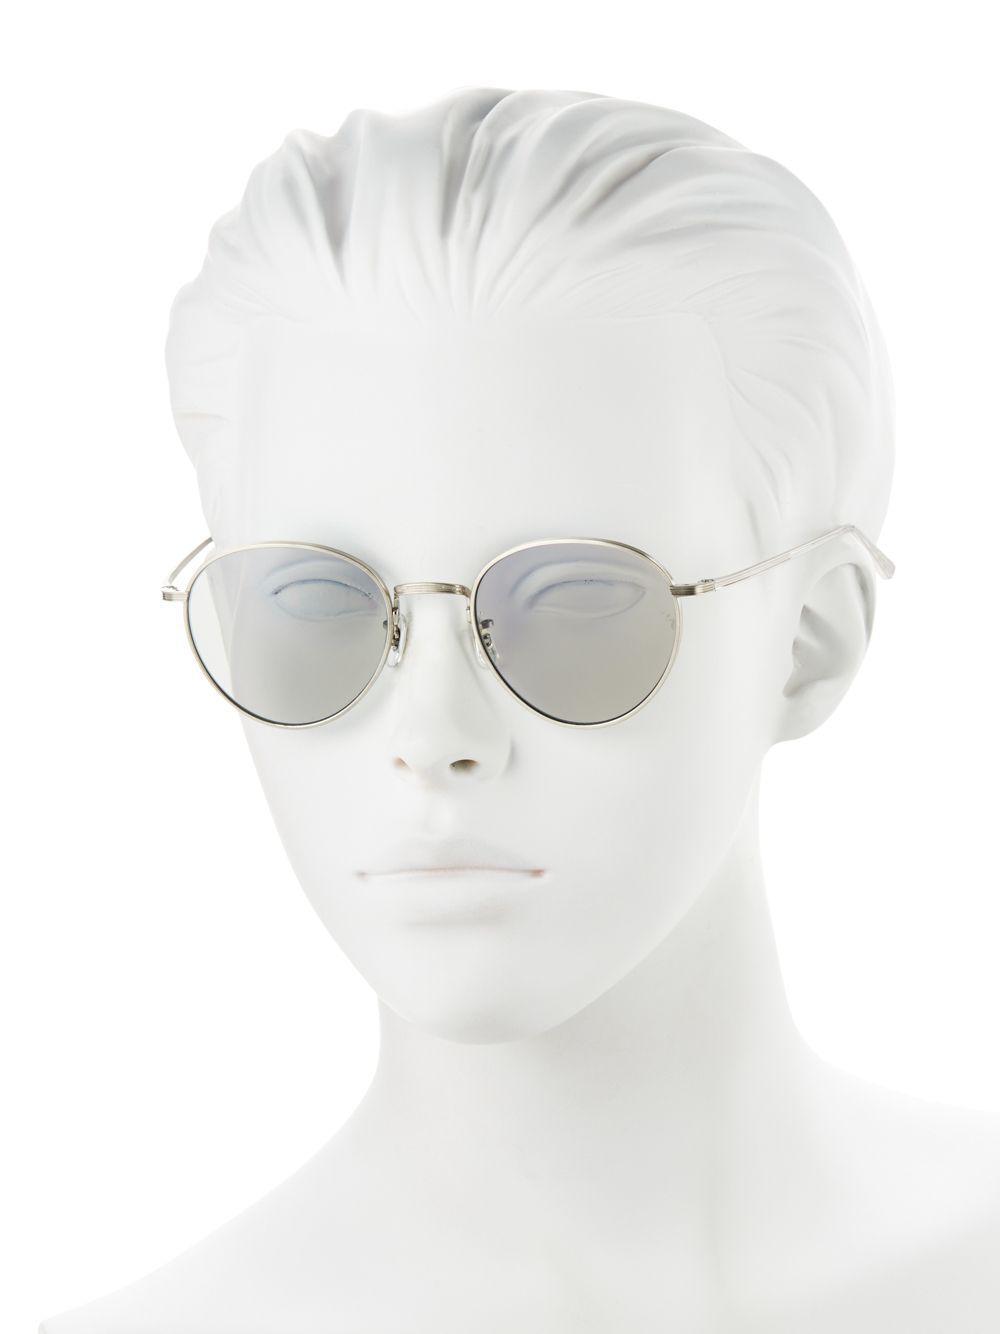 f8c7aeadce7 Oliver Peoples - Metallic Brownstone 2 49mm Round Sunglasses - Lyst. View  fullscreen